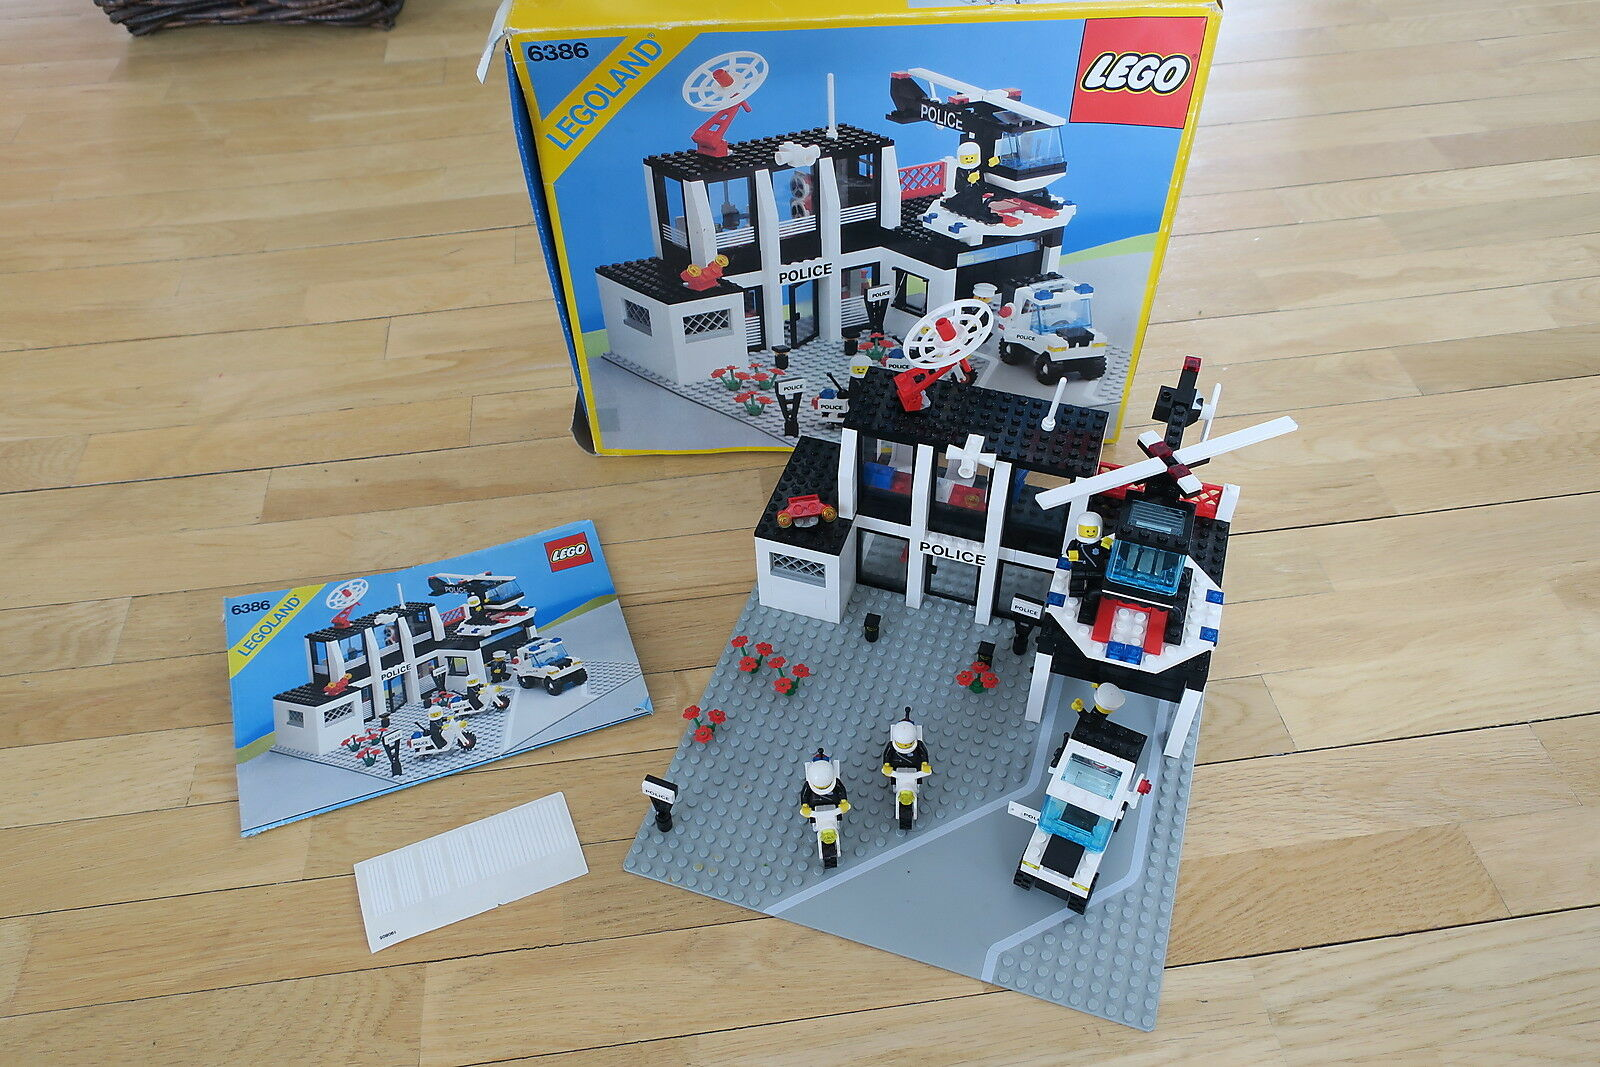 Lego 6386-City Police Station Police Station